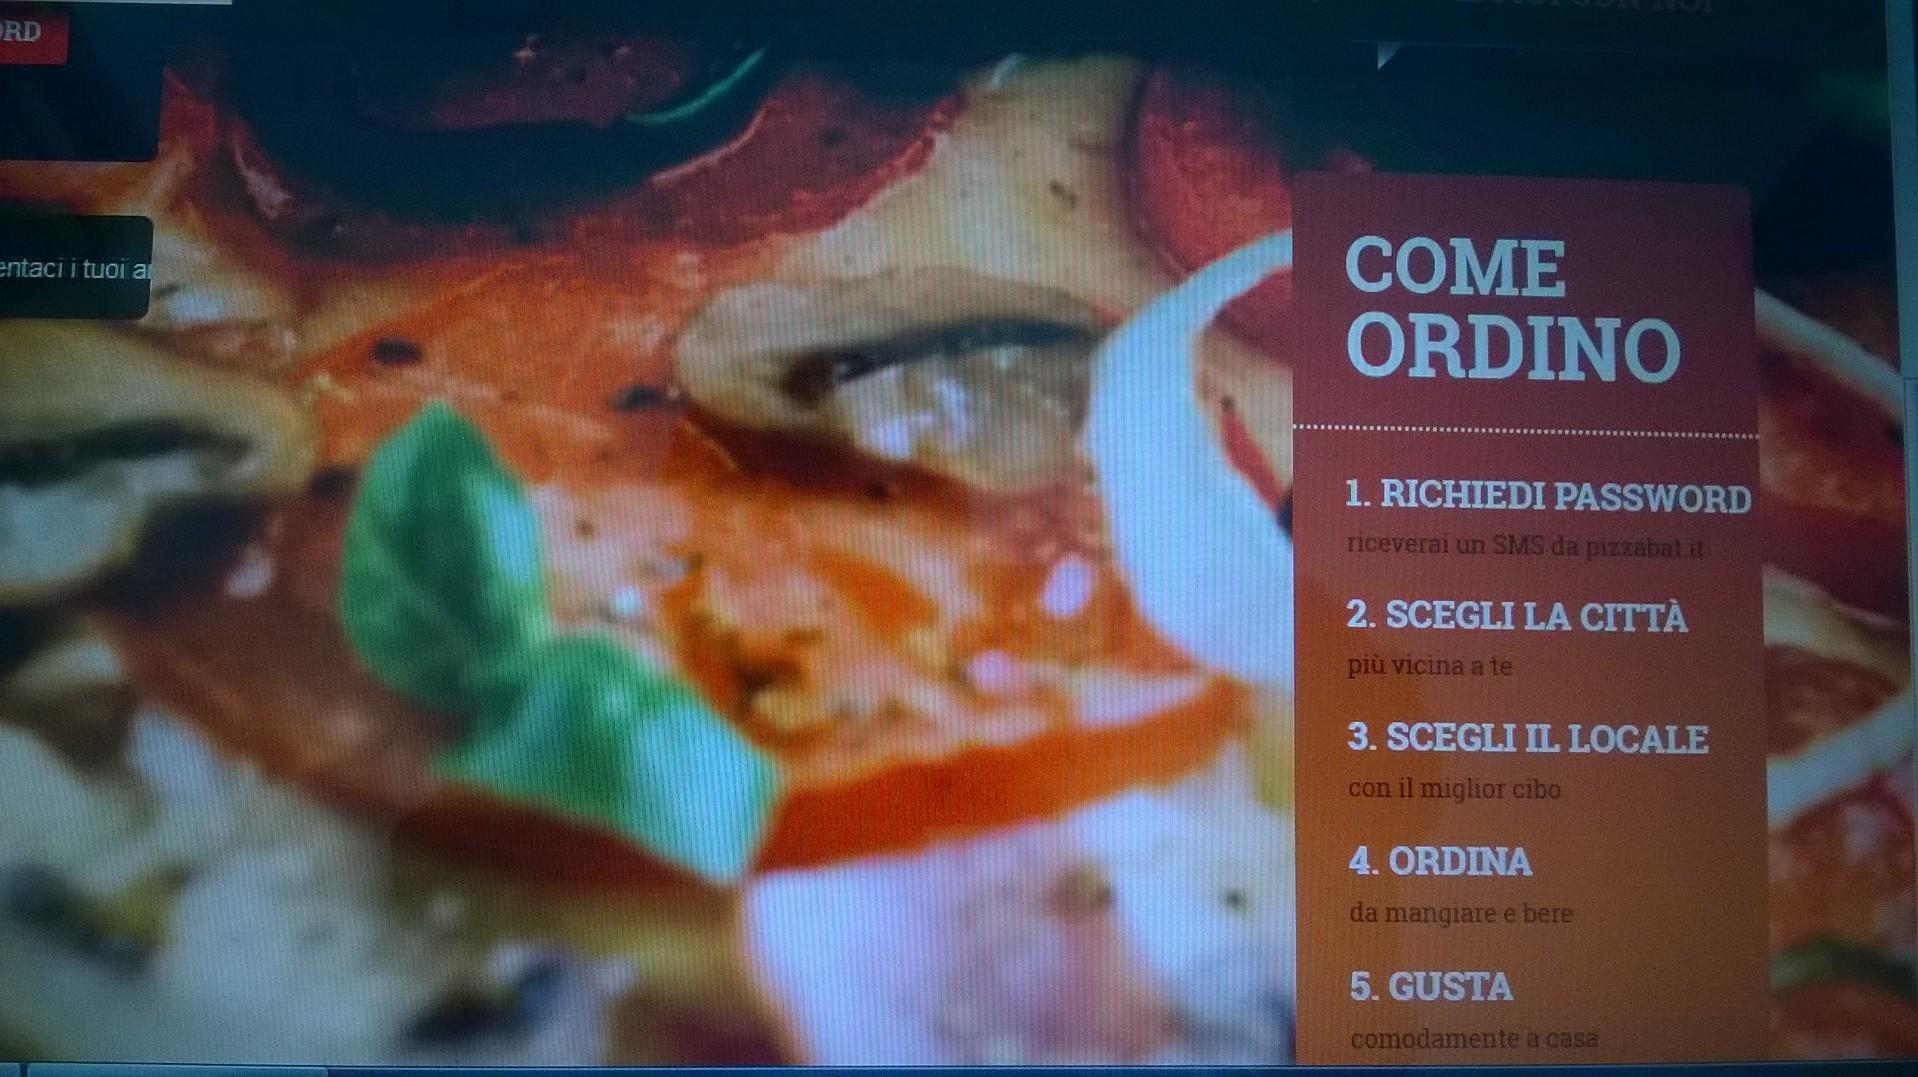 Pizzabat.it/PIZZABAT